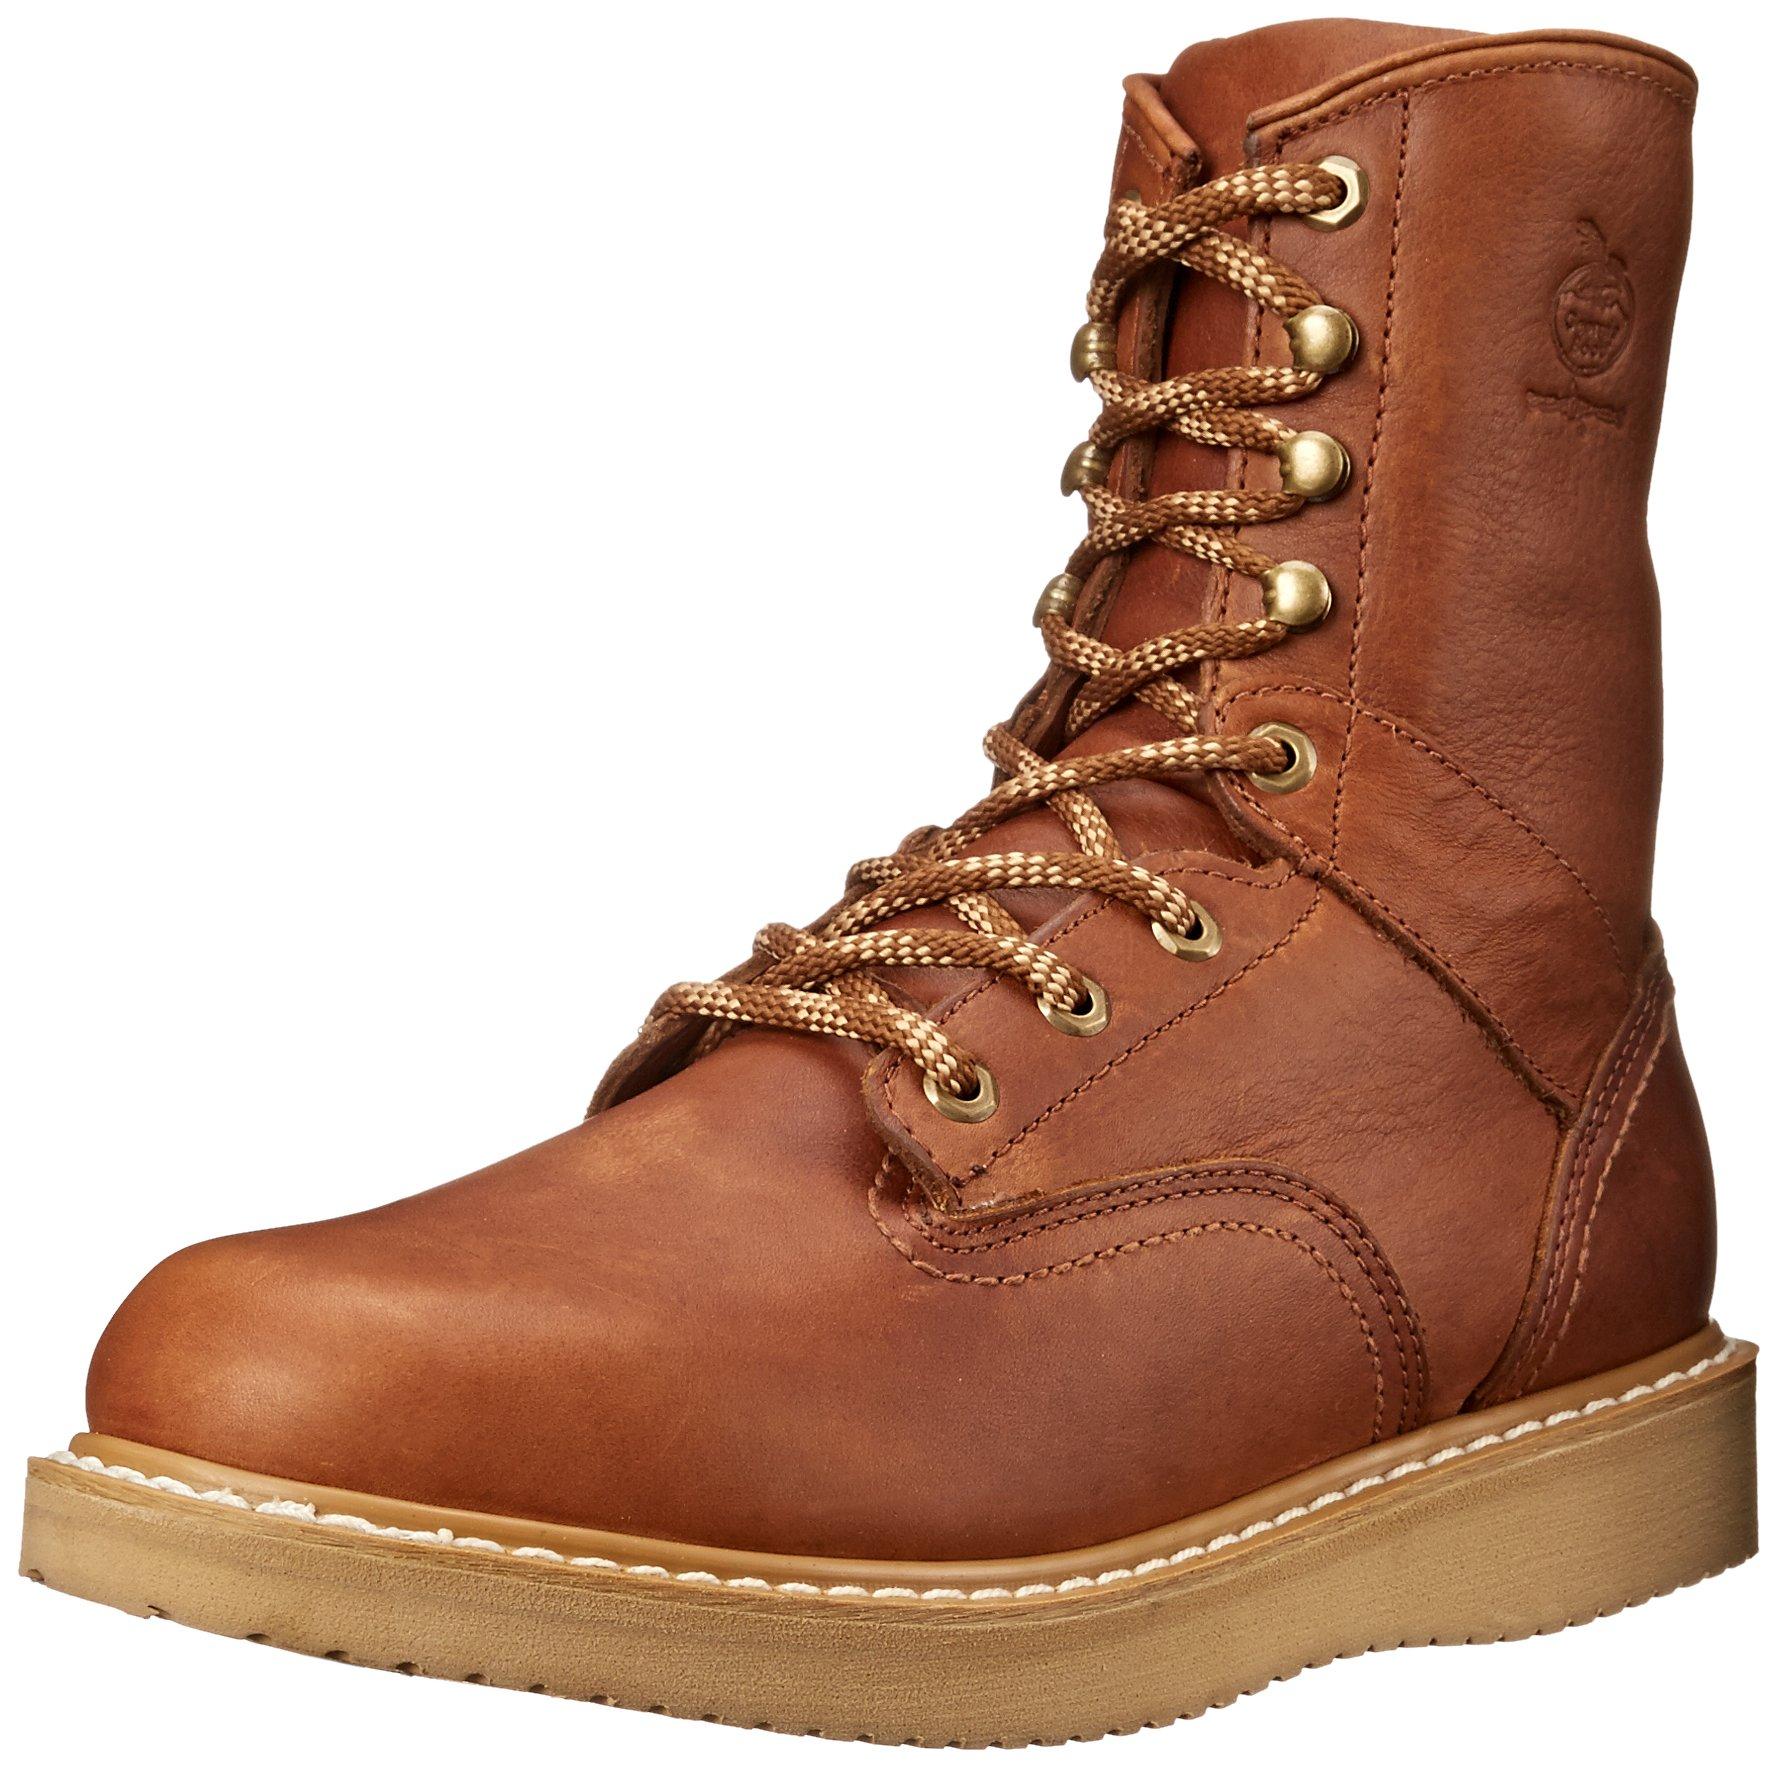 Georgia Boot Men's 8 Inch Wedge Work Shoe, Barracuda Gold, 11 M US